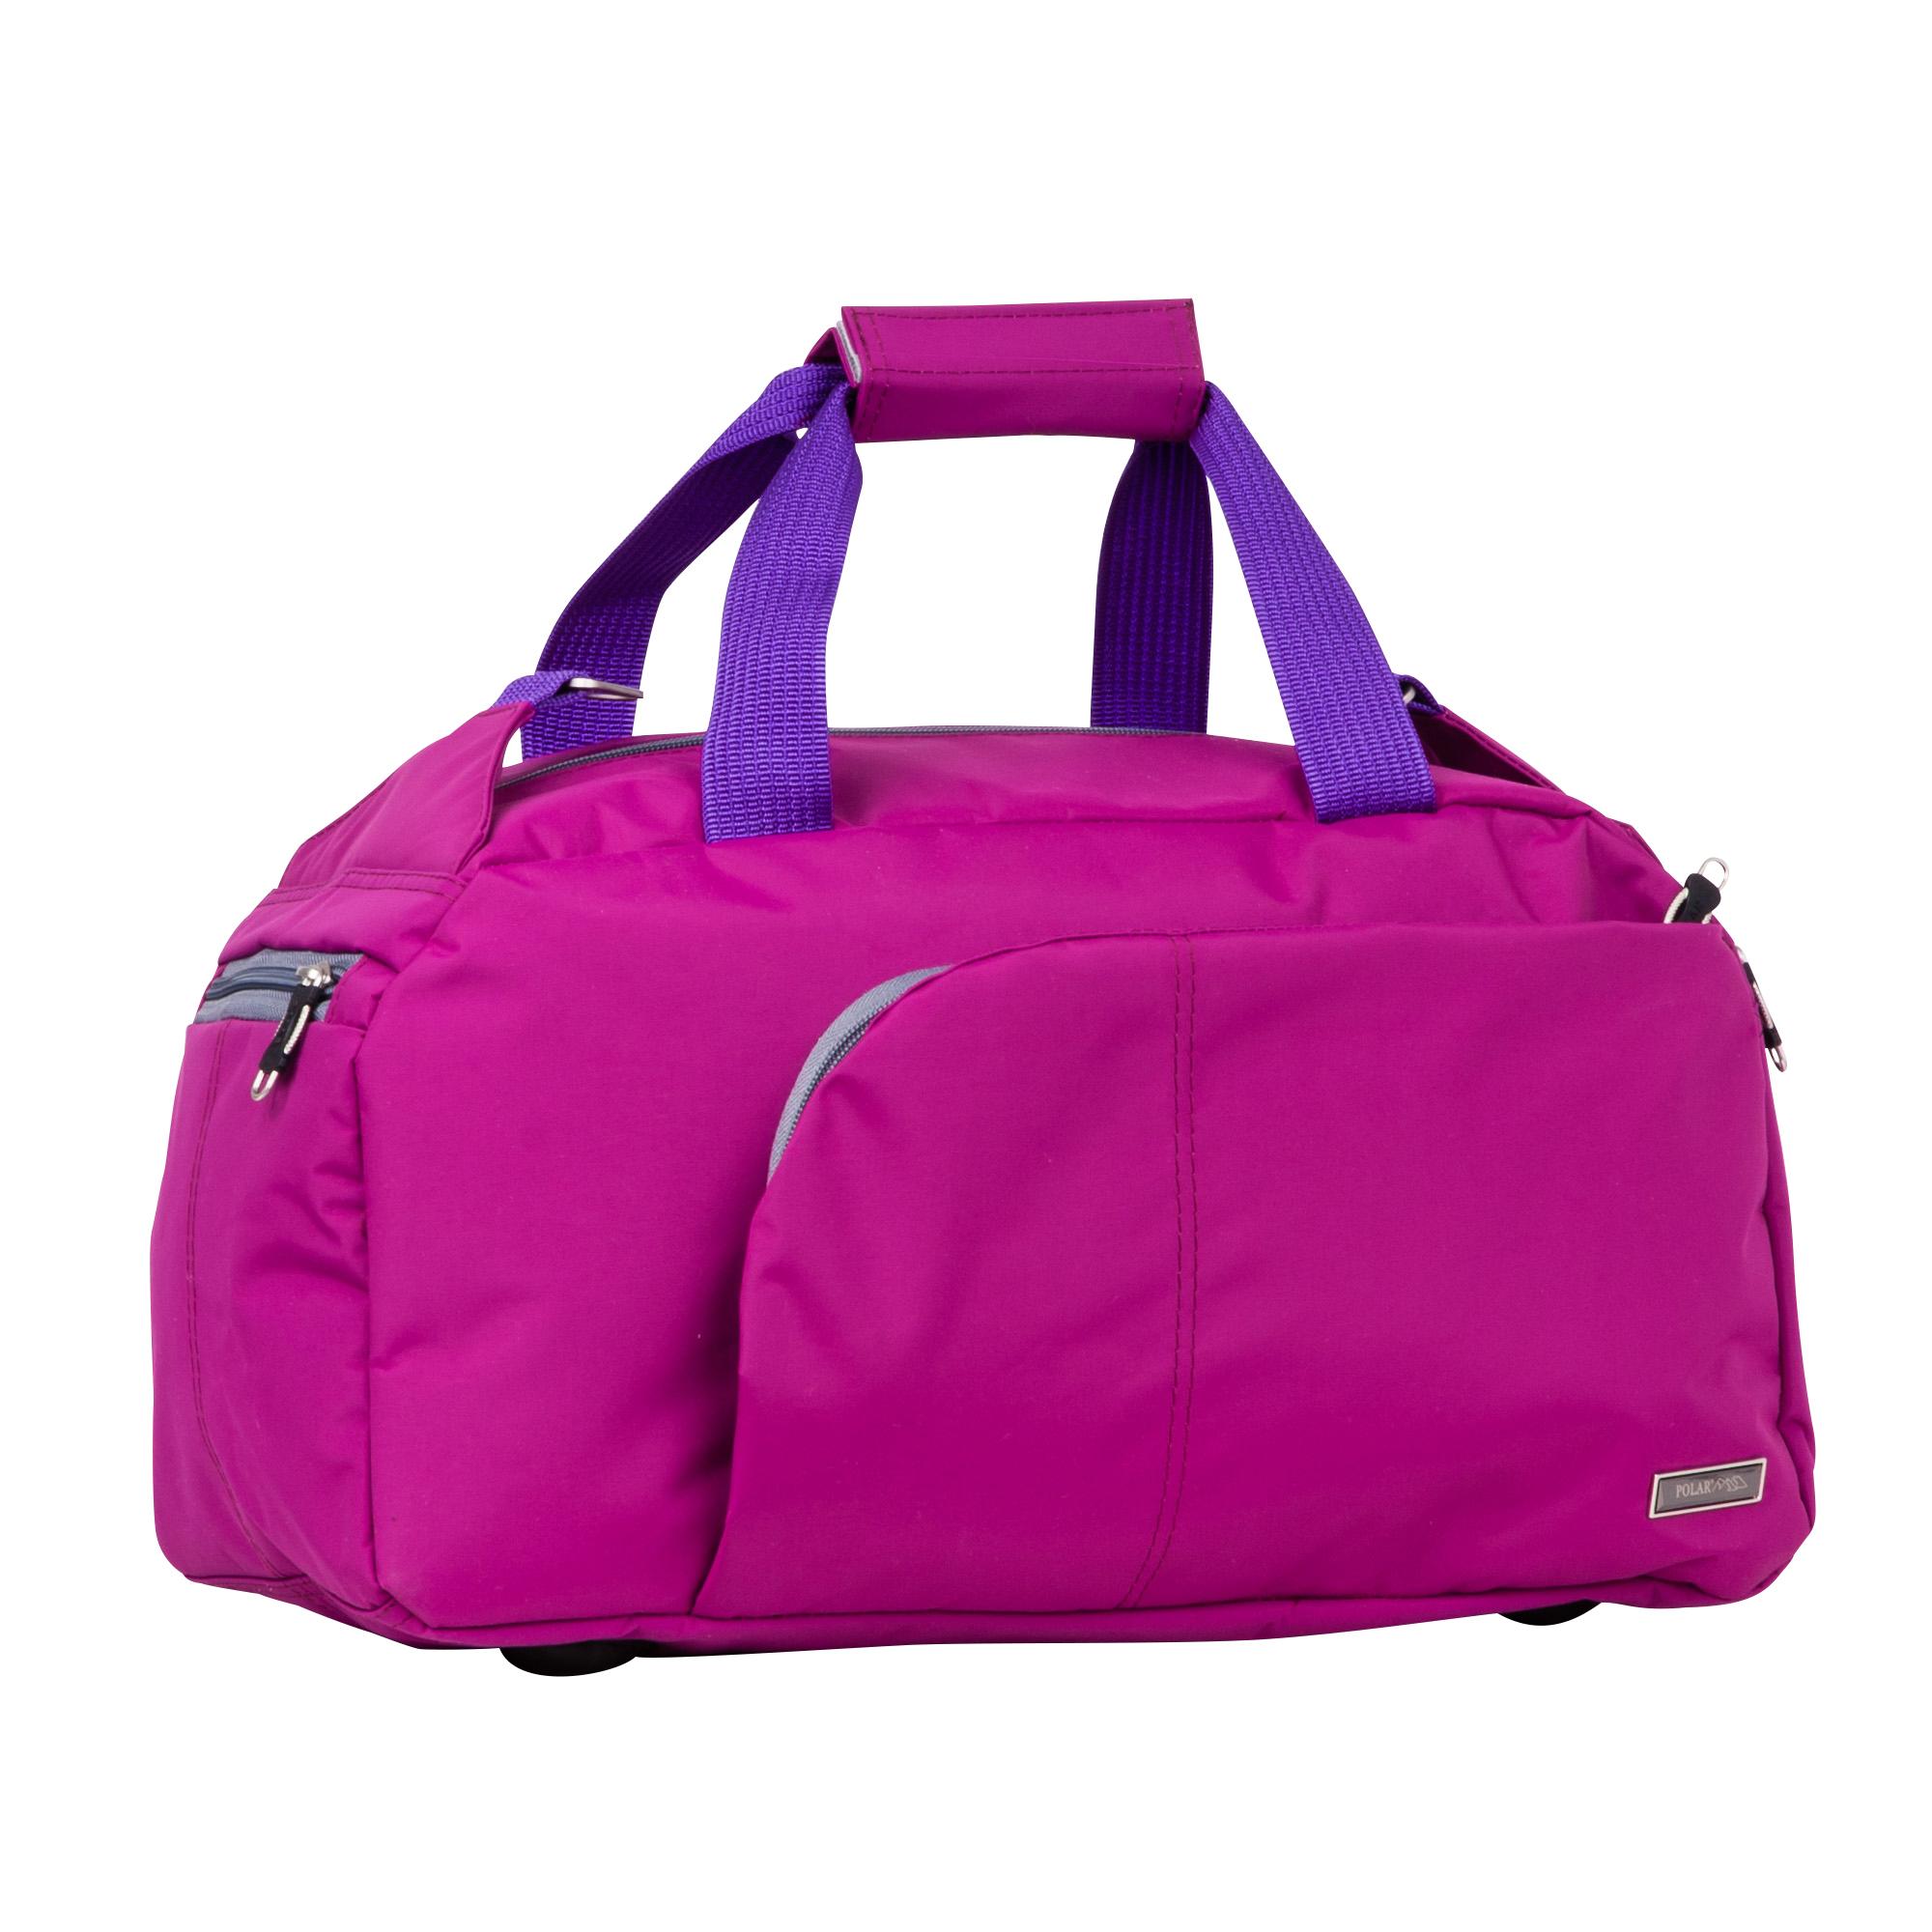 Спортивная сумка Polar П7072 сиреневая